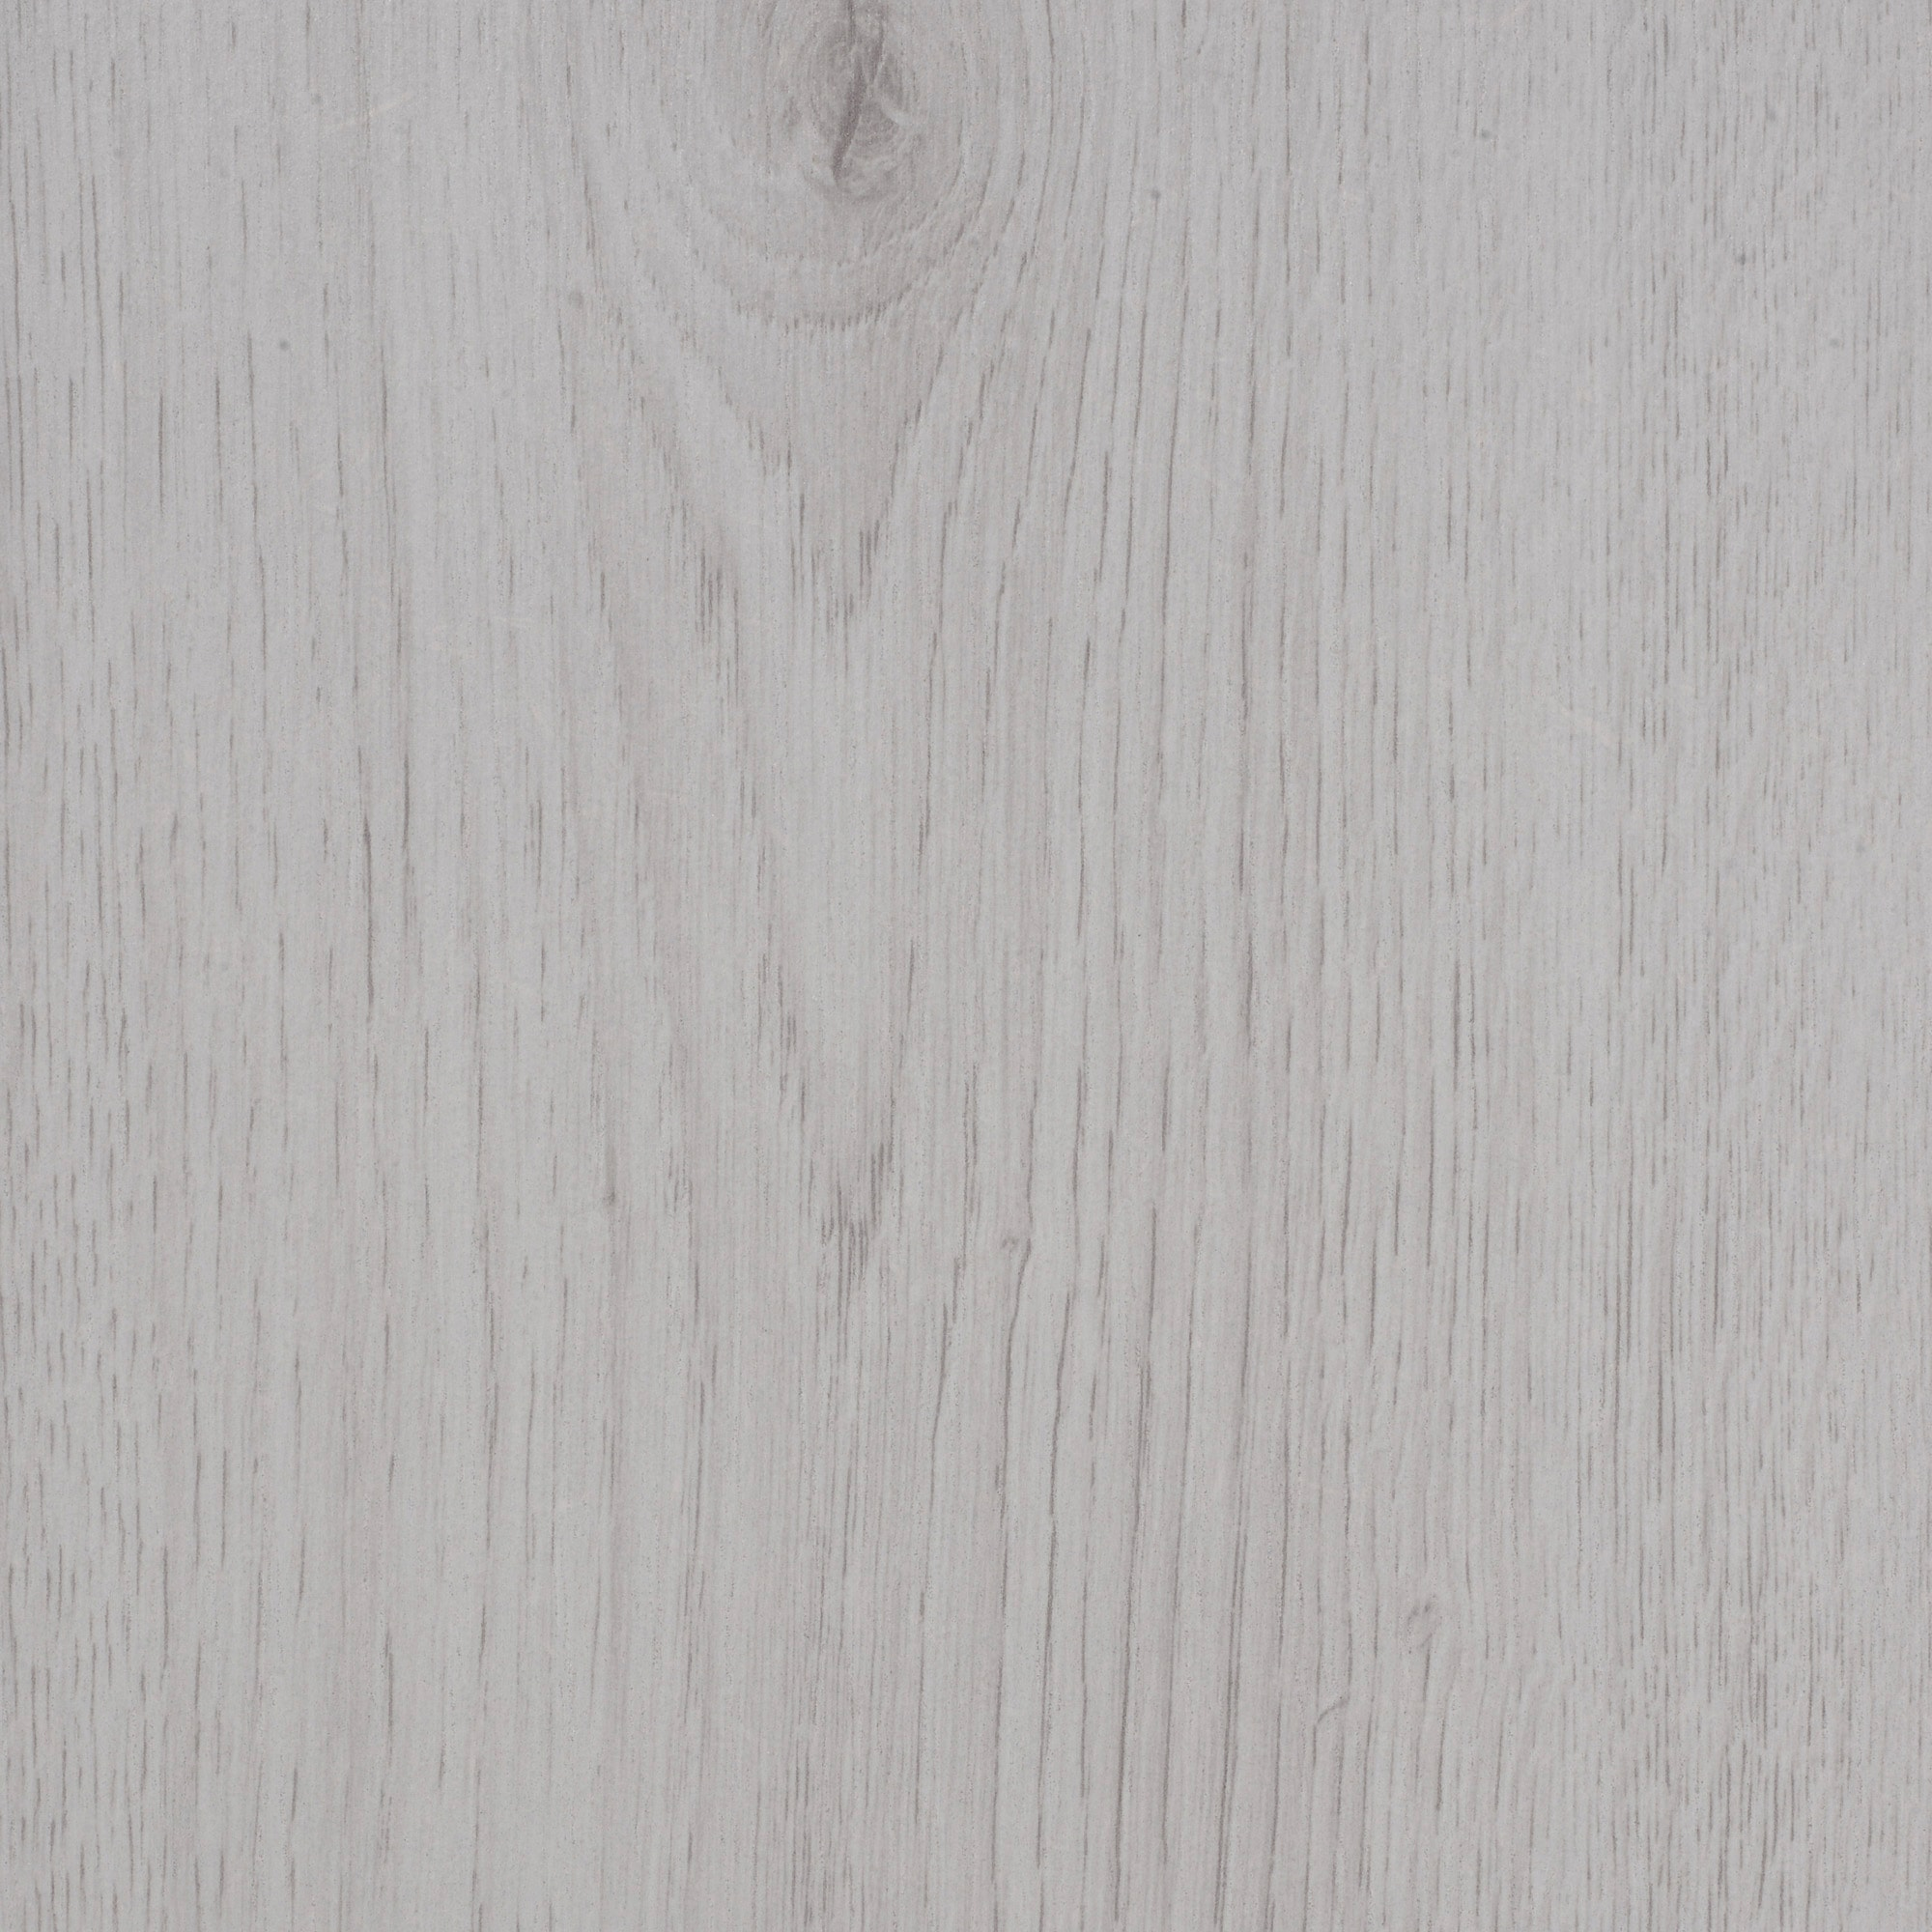 bodenmeister laminat topflor eiche nachbildung 1376 x. Black Bedroom Furniture Sets. Home Design Ideas